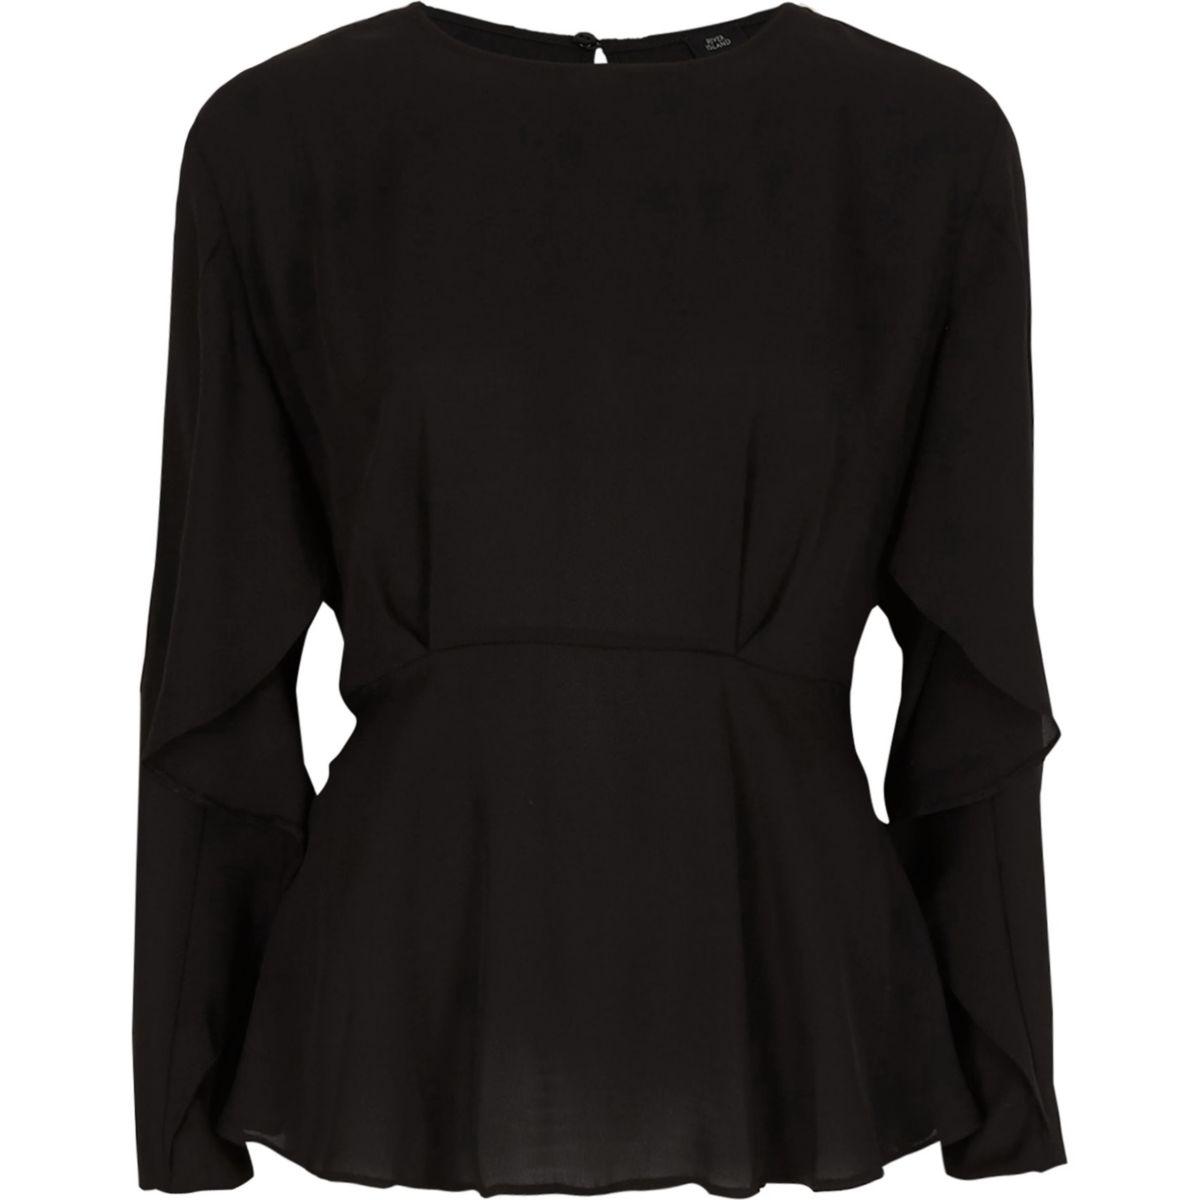 Black frill long sleeve blouse